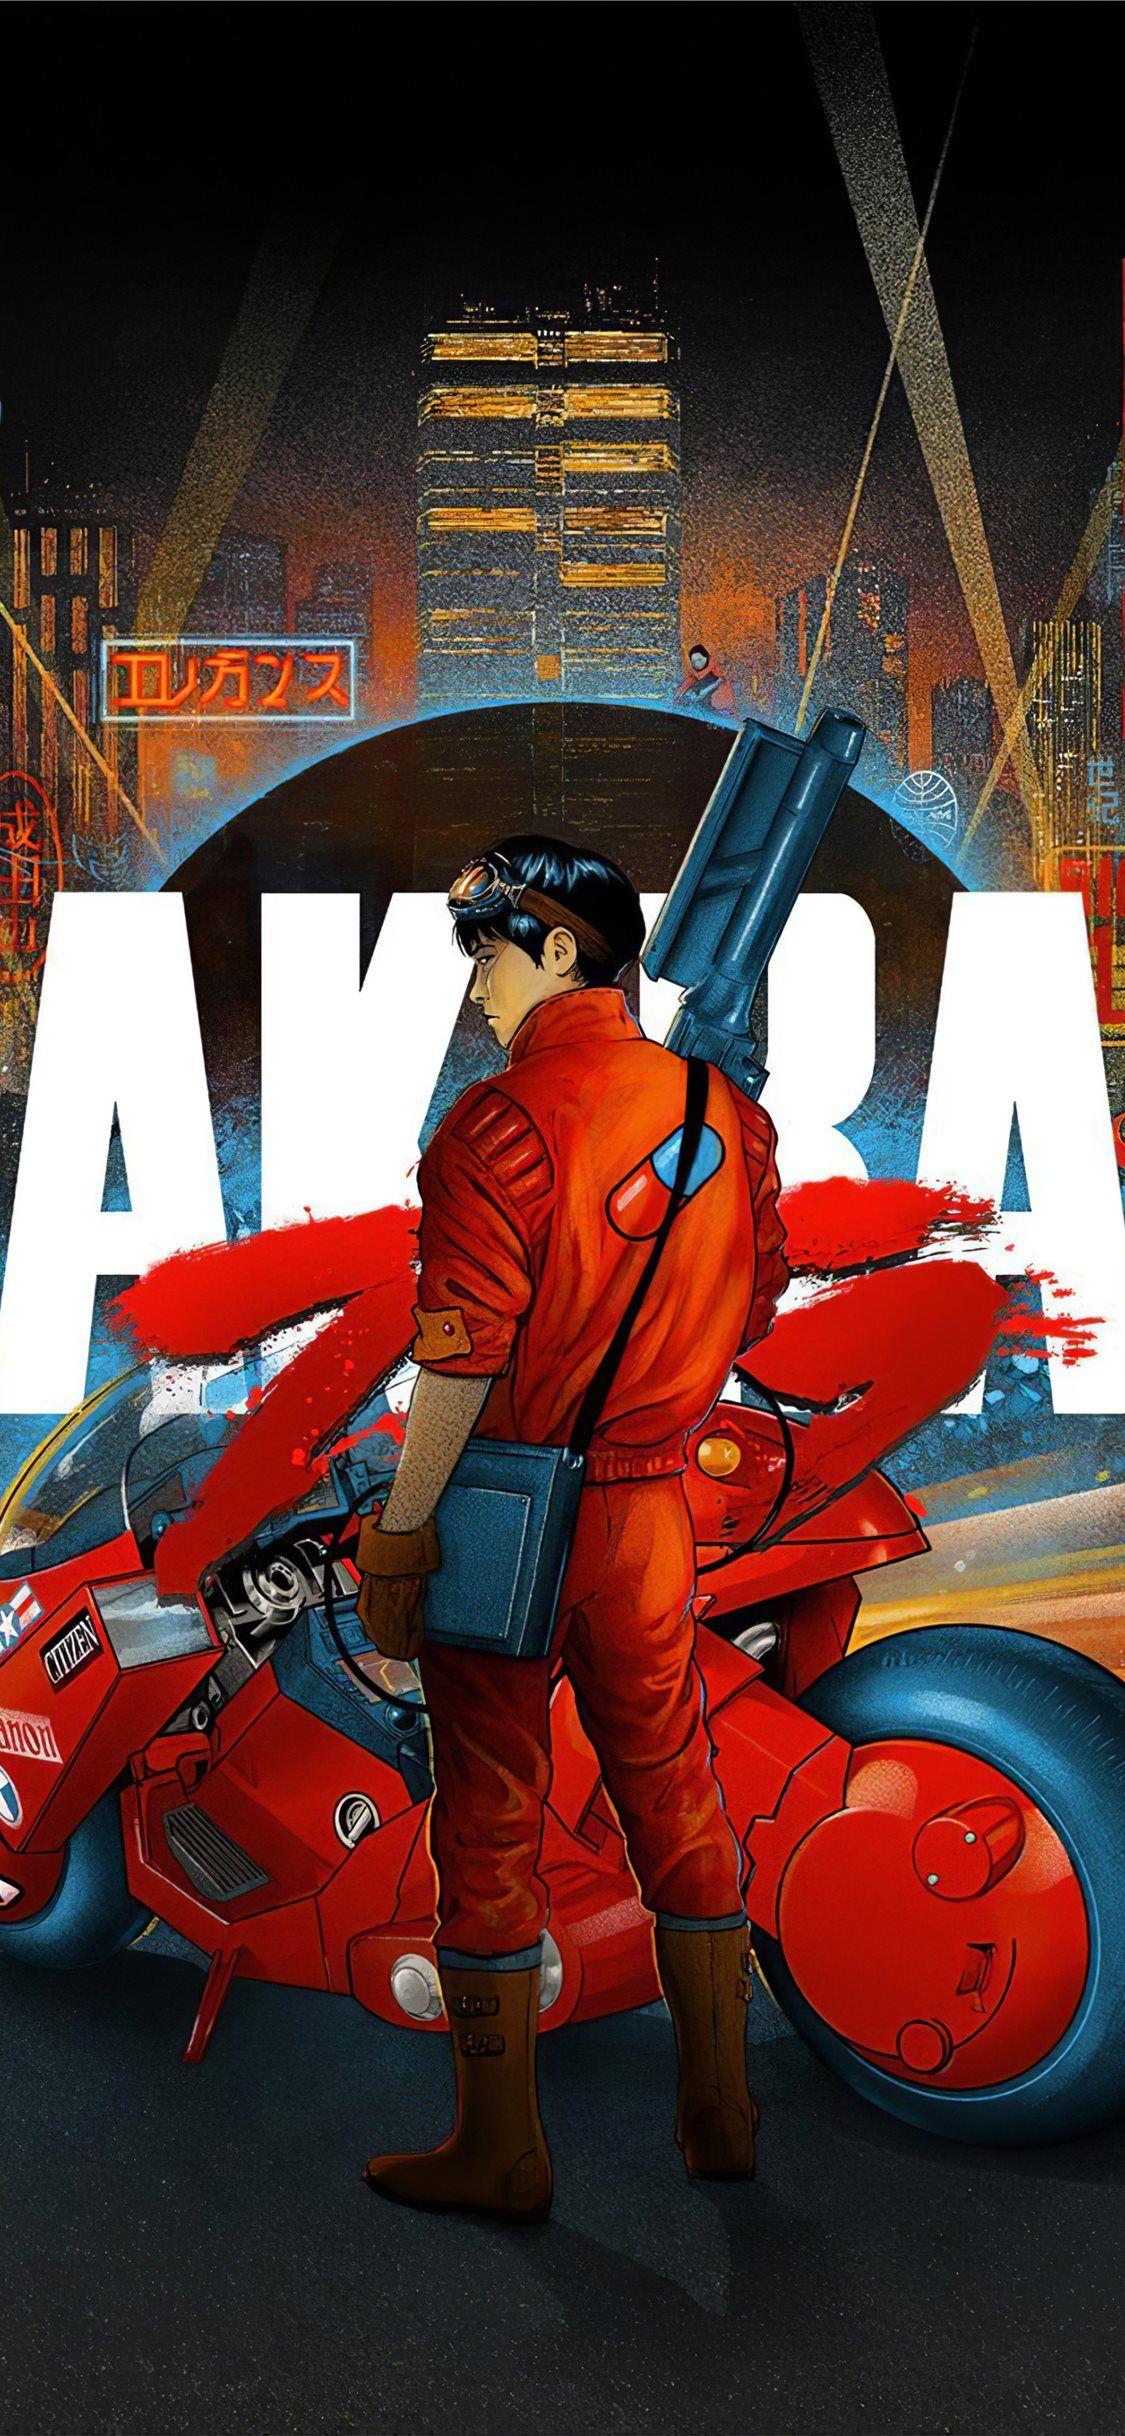 Akira 19 Movies 4k Iphone11wallpaper In Akira Wallpaper Japanese Waves